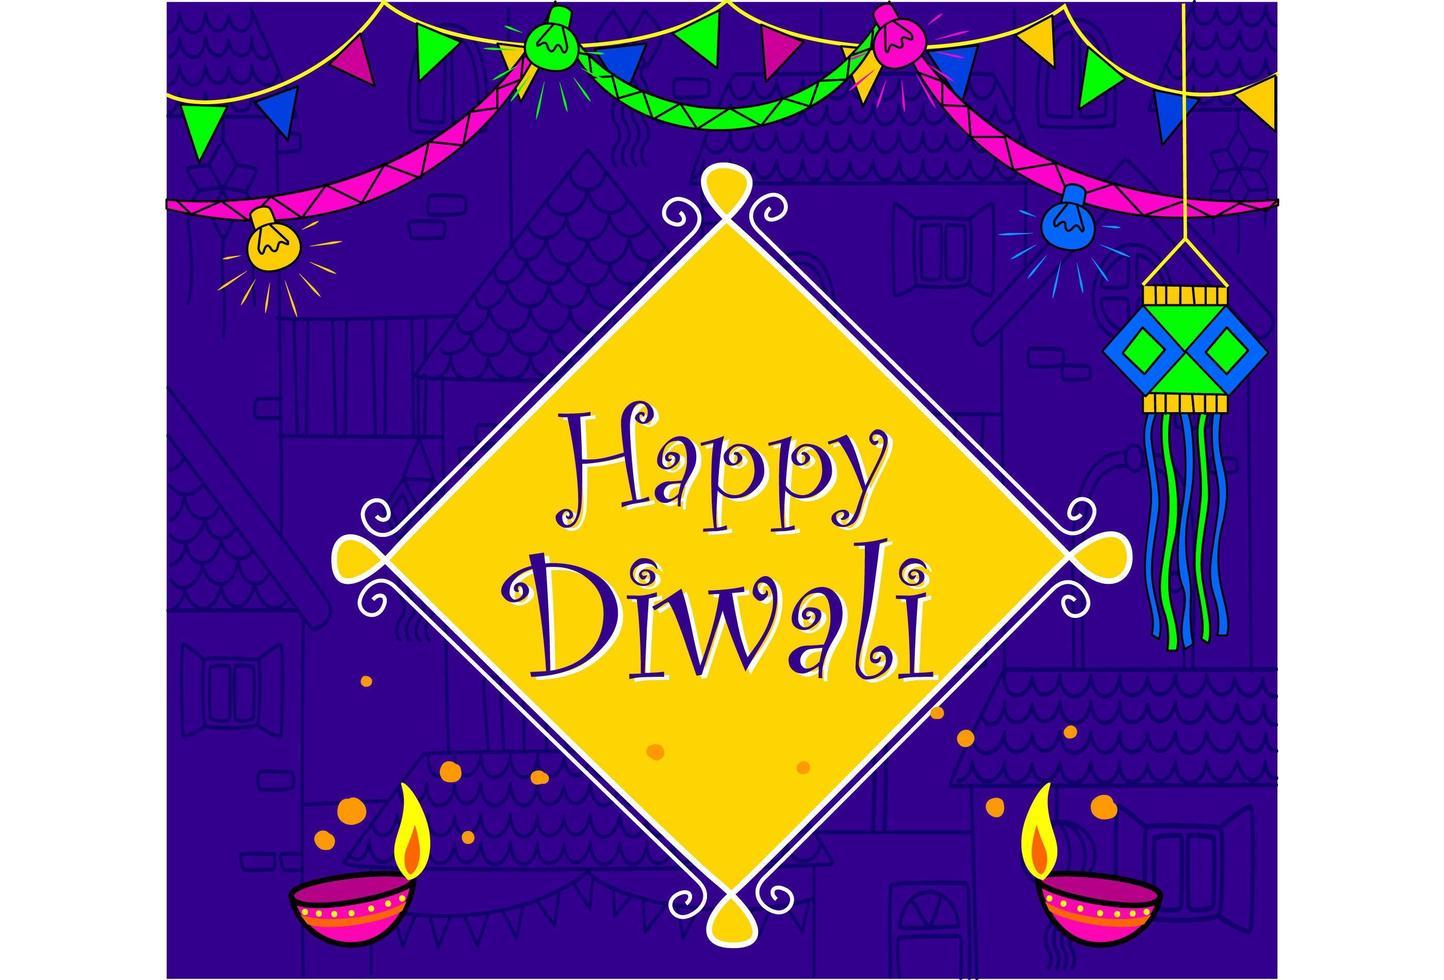 indisk festival diwali tapet i neonfärg vektor